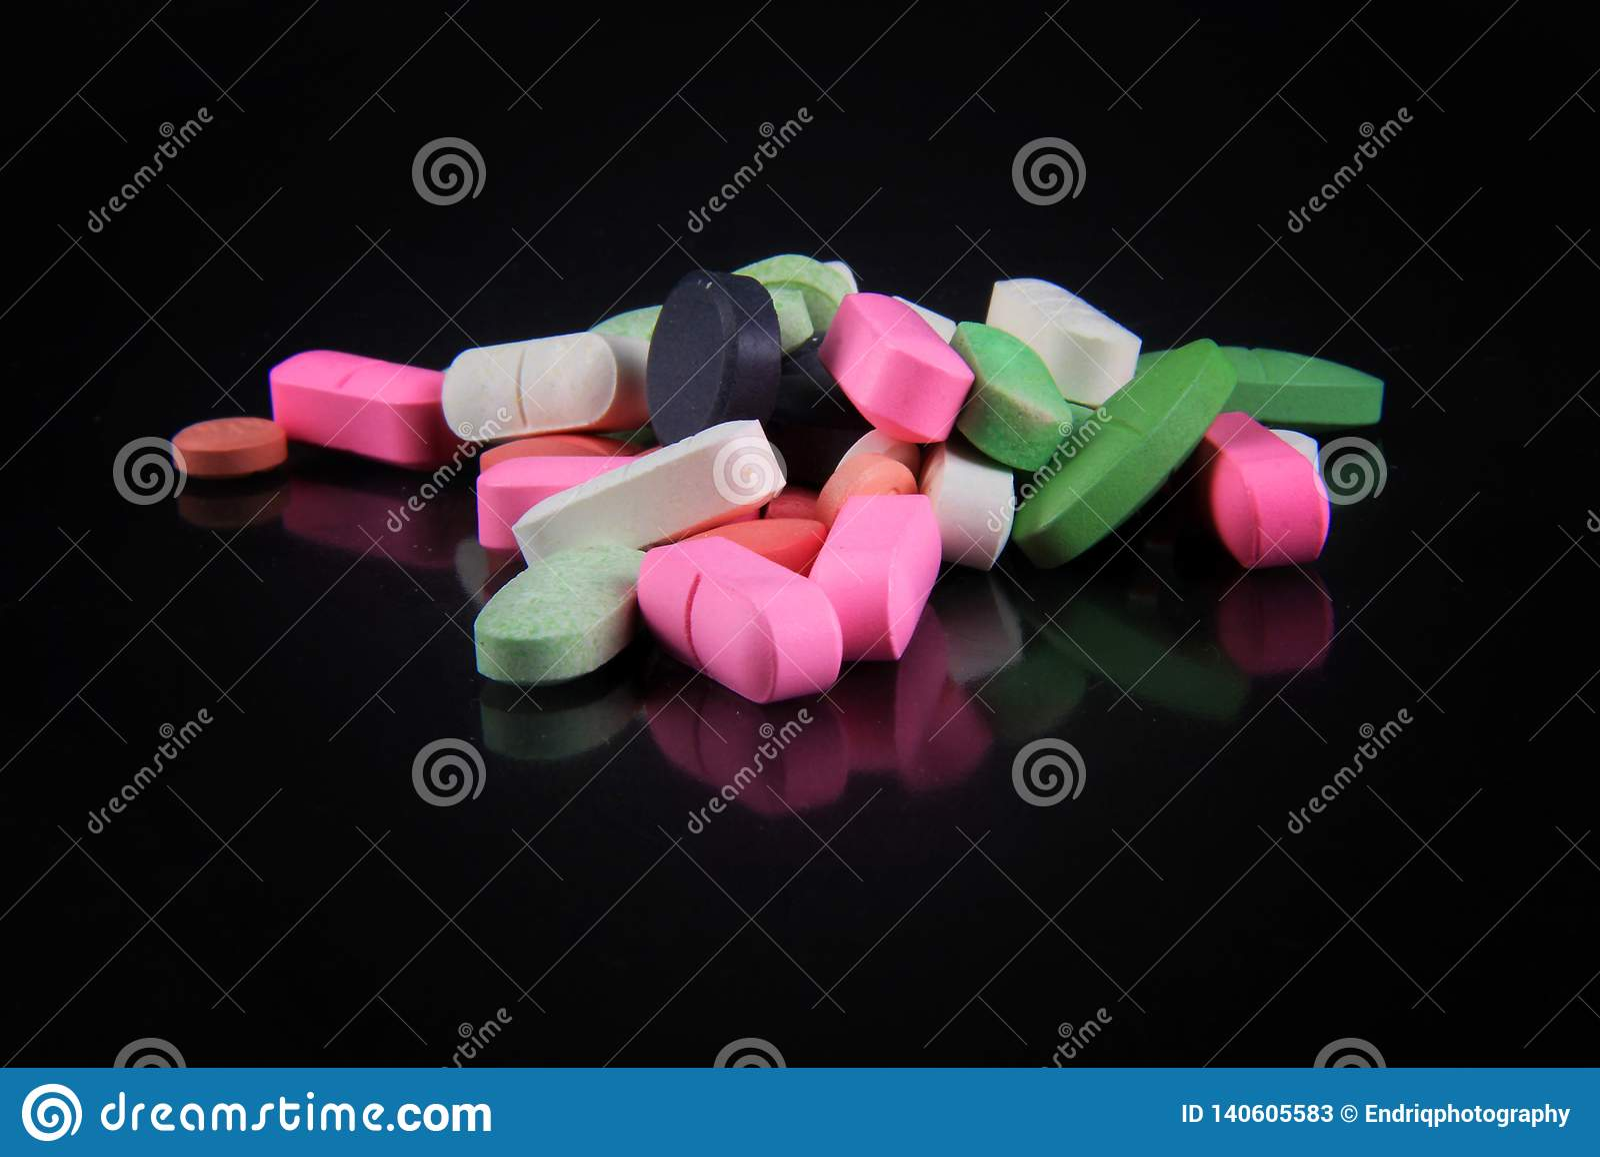 Vari tipi di droghe per le malattie